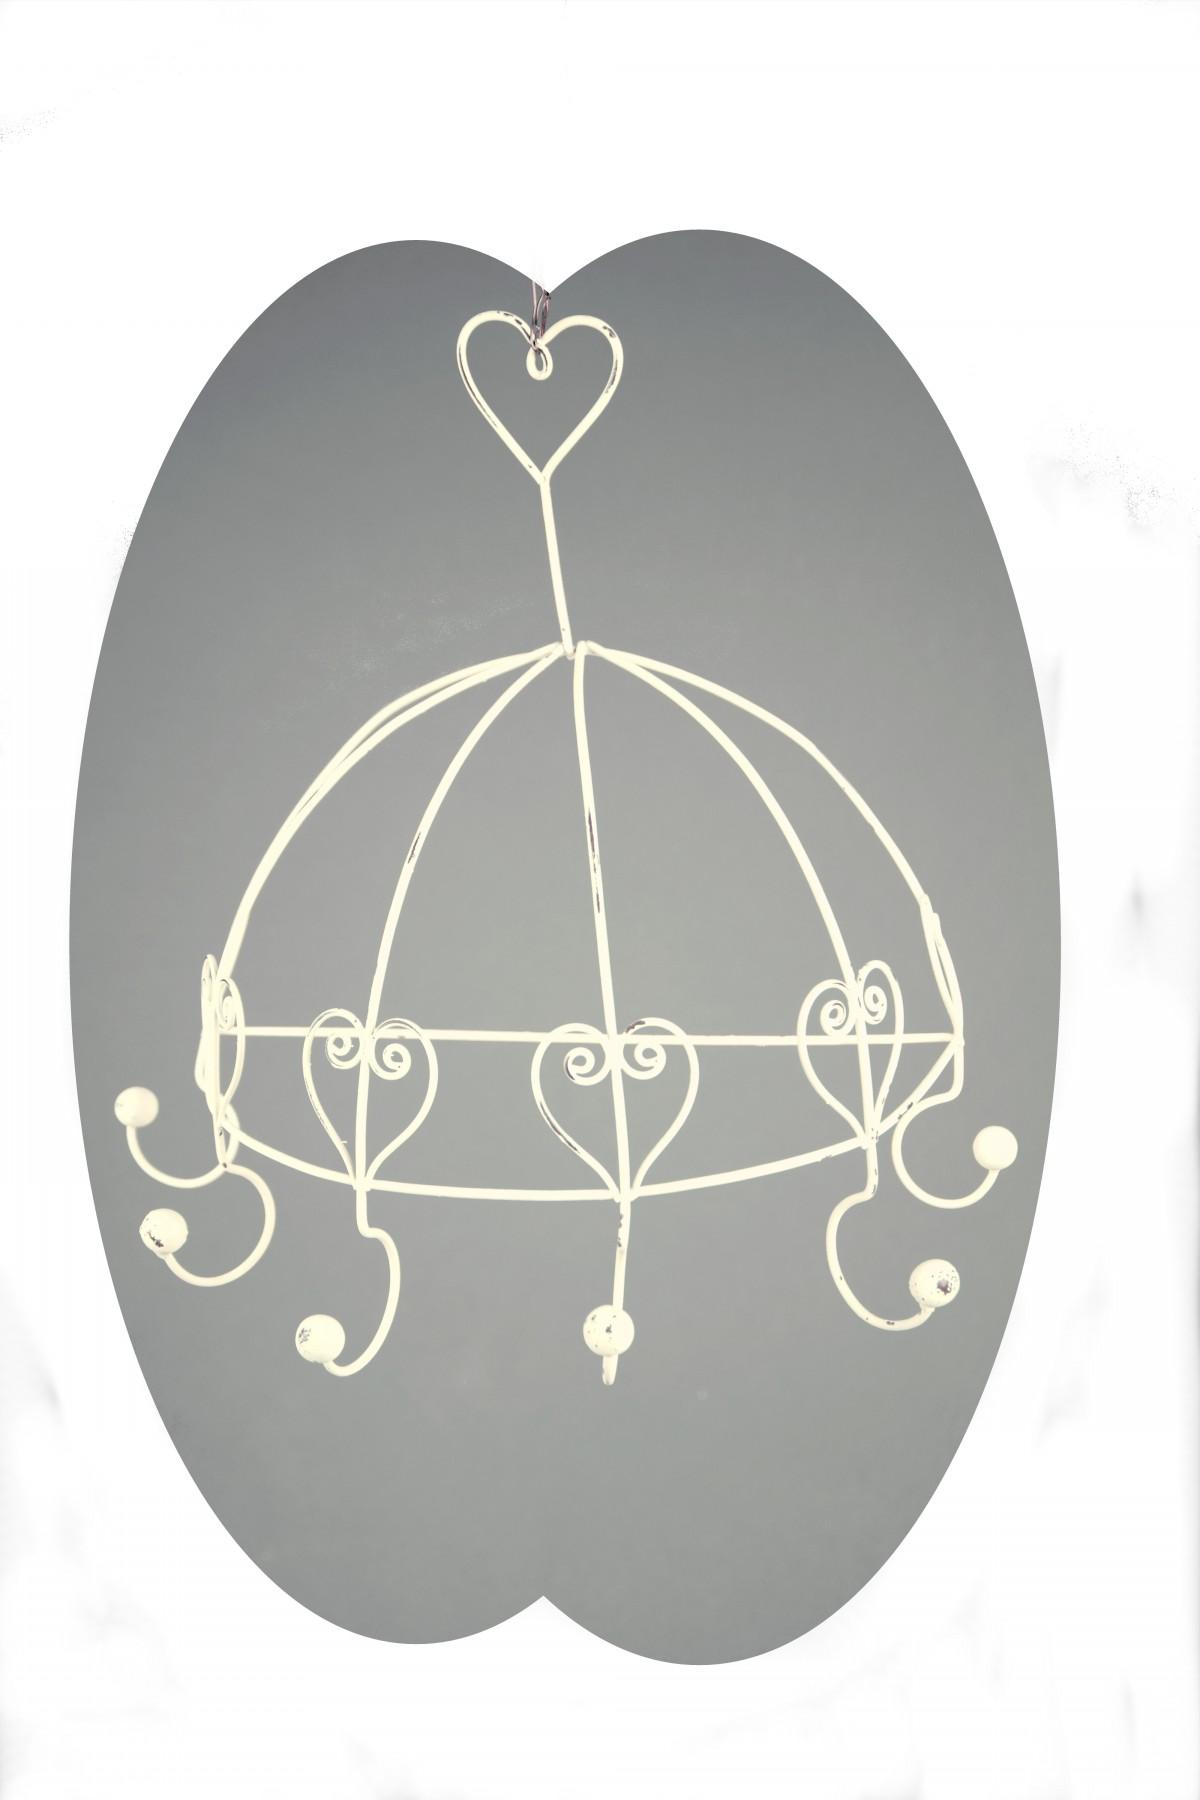 Věšák na zeď půlkruh srdce 6 háčků bílý 32,5x31,5x15,5cm